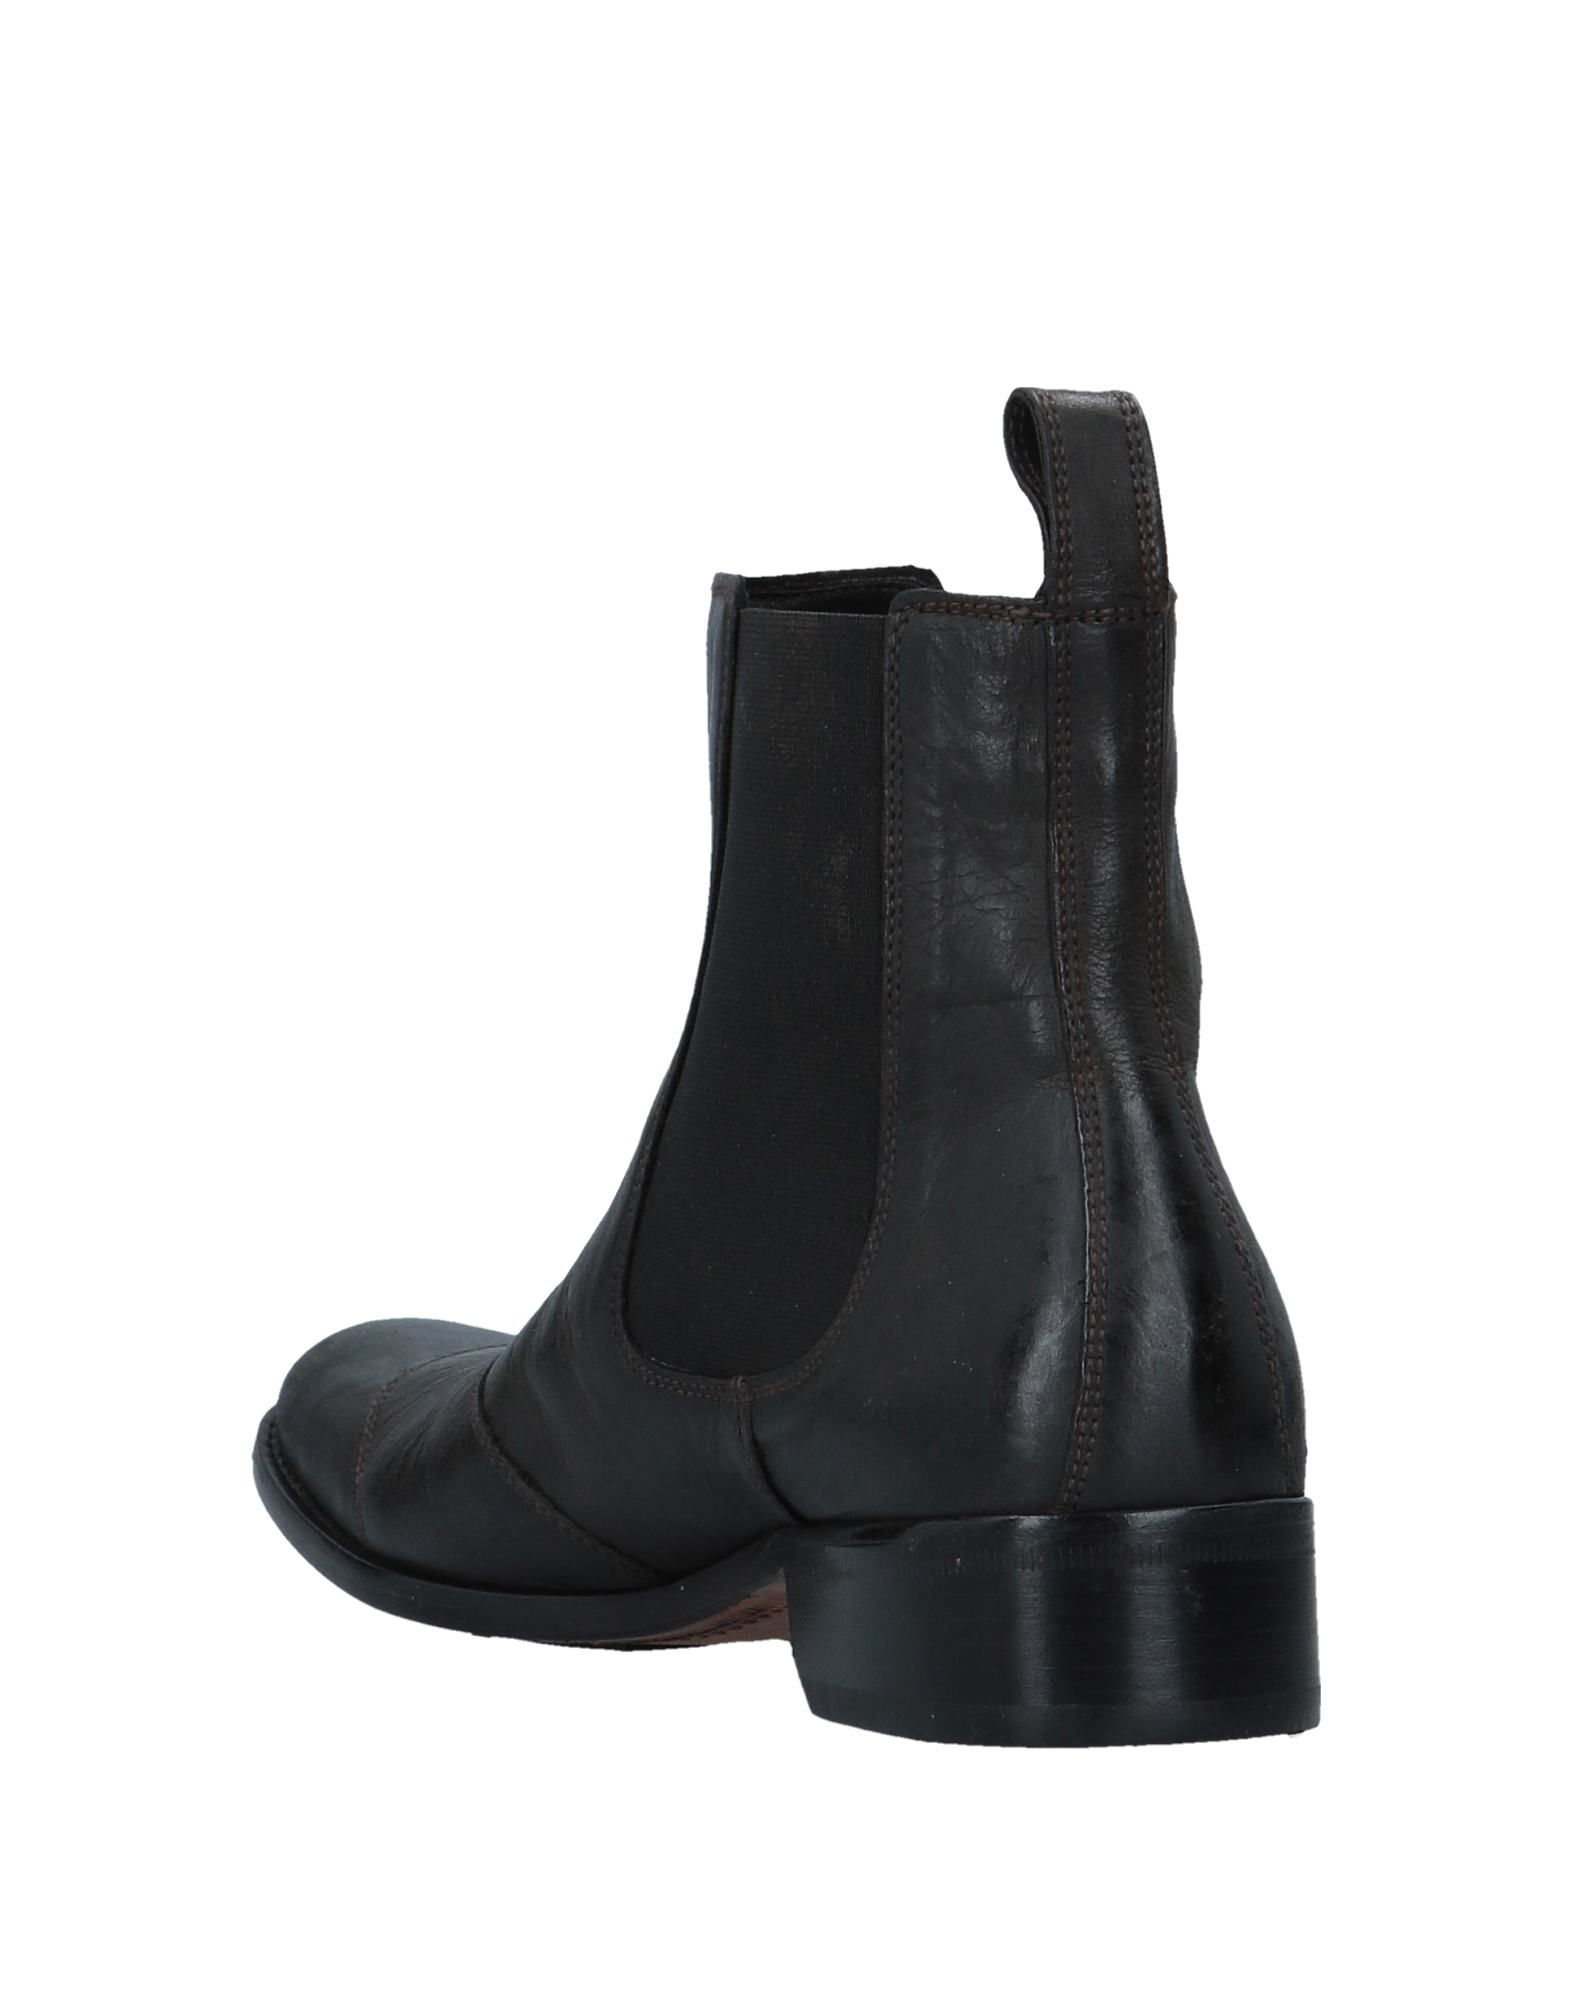 Belstaff Stiefelette Herren  11535790EE Gute Qualität beliebte Schuhe